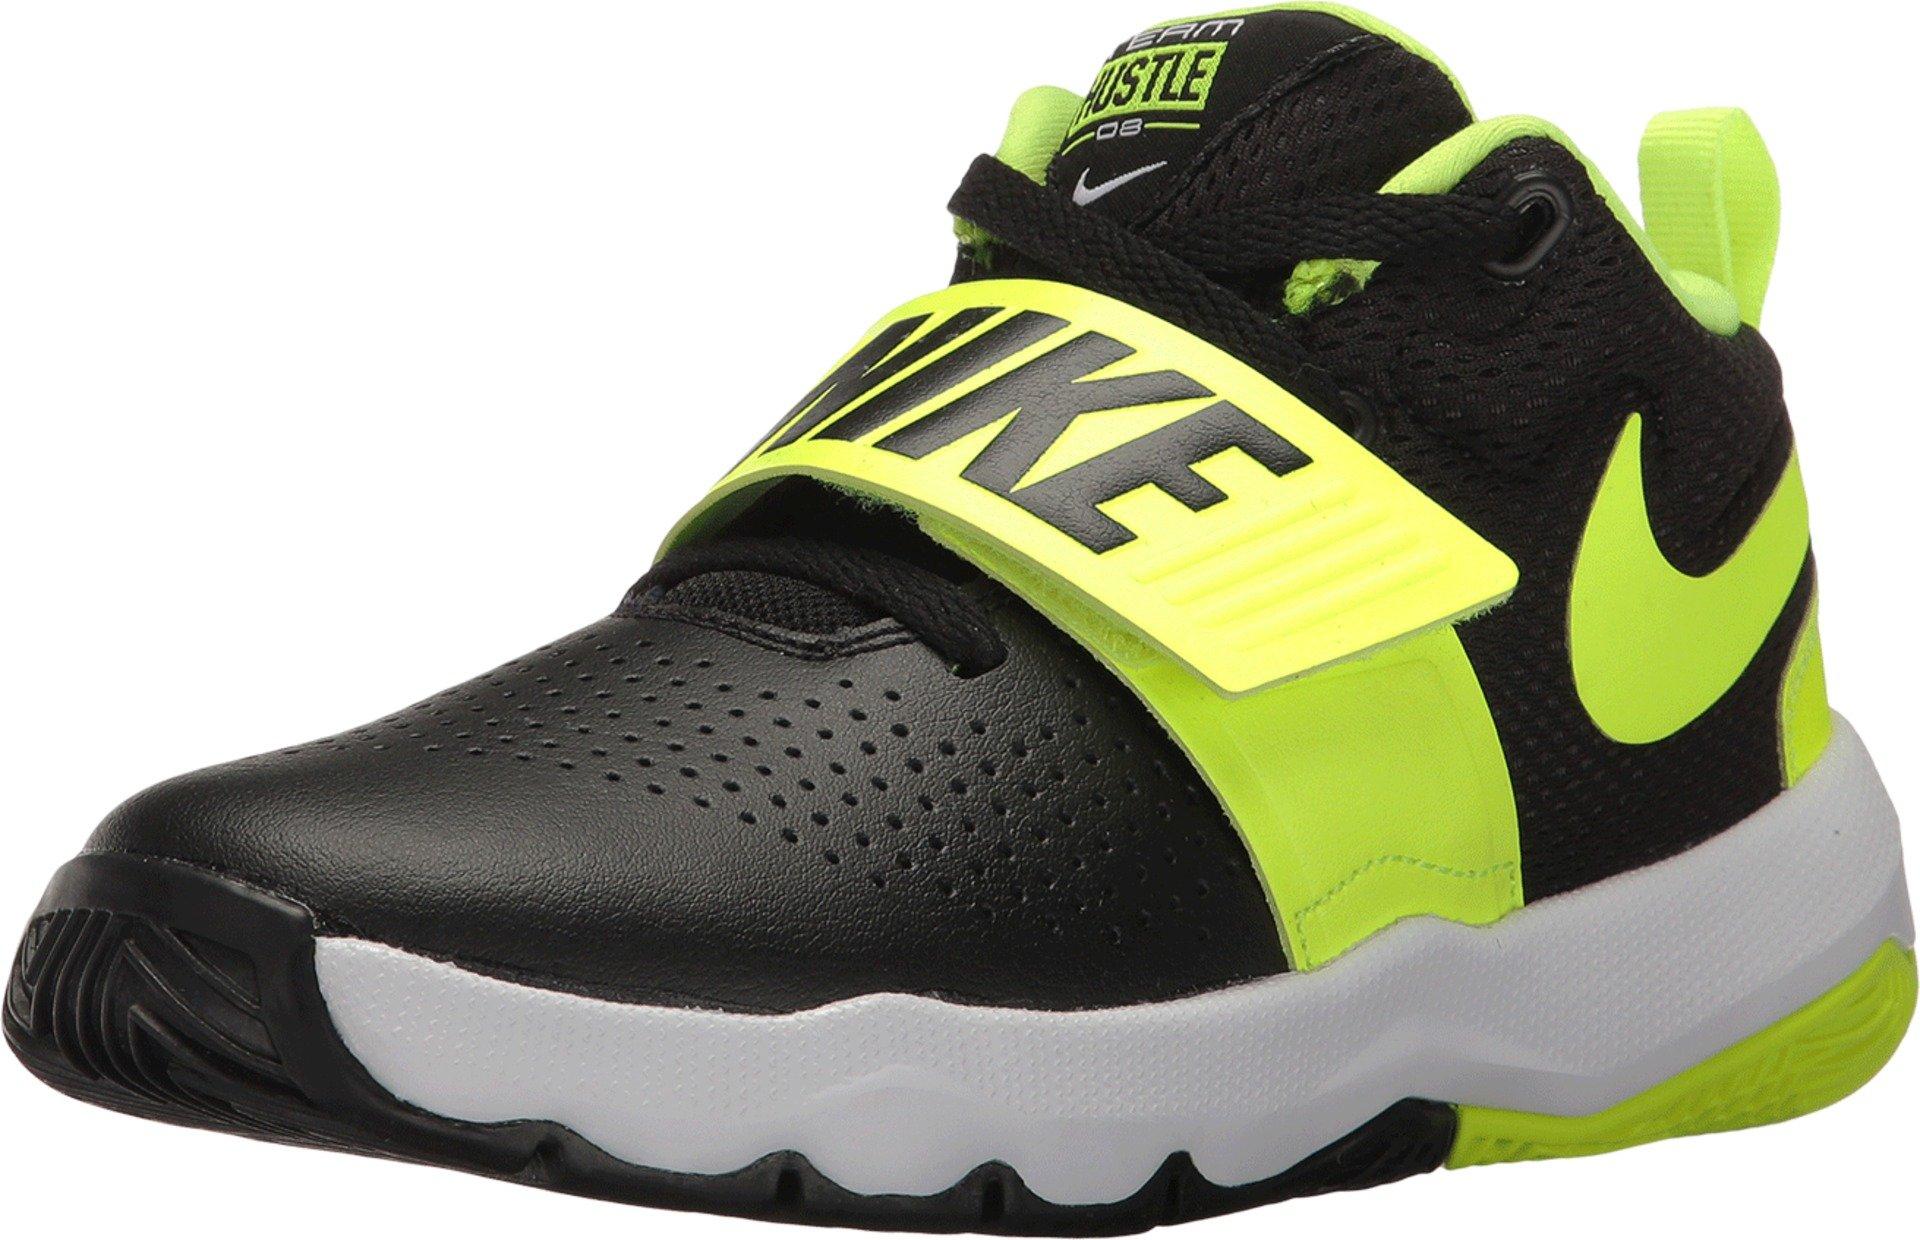 69037e9378828 Galleon - Nike Kids' Preschool Team Hustle D 8 Basketball Shoes (12K,  Black/Volt-M)